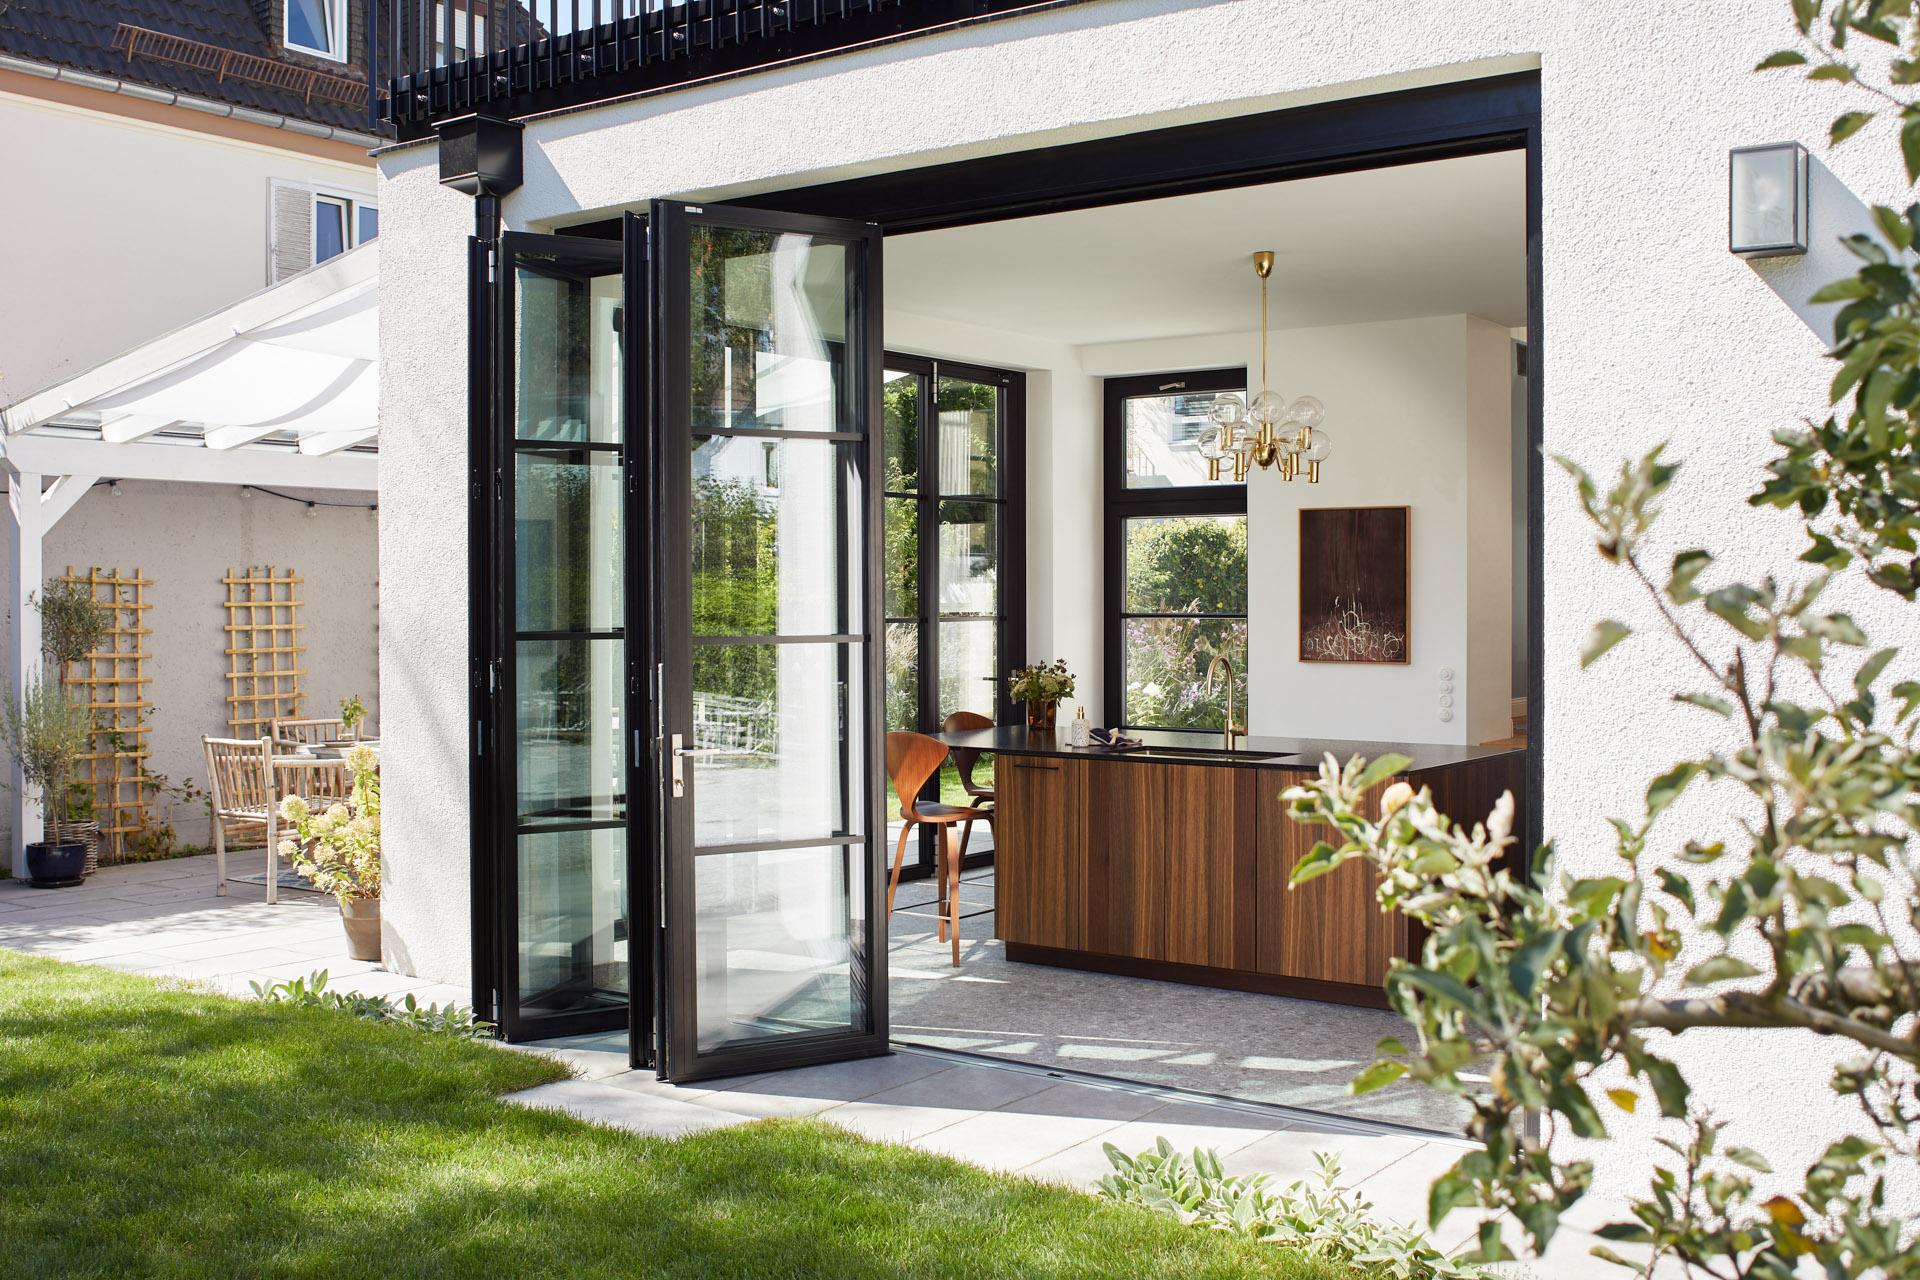 Solarlux Highline bi-folding door